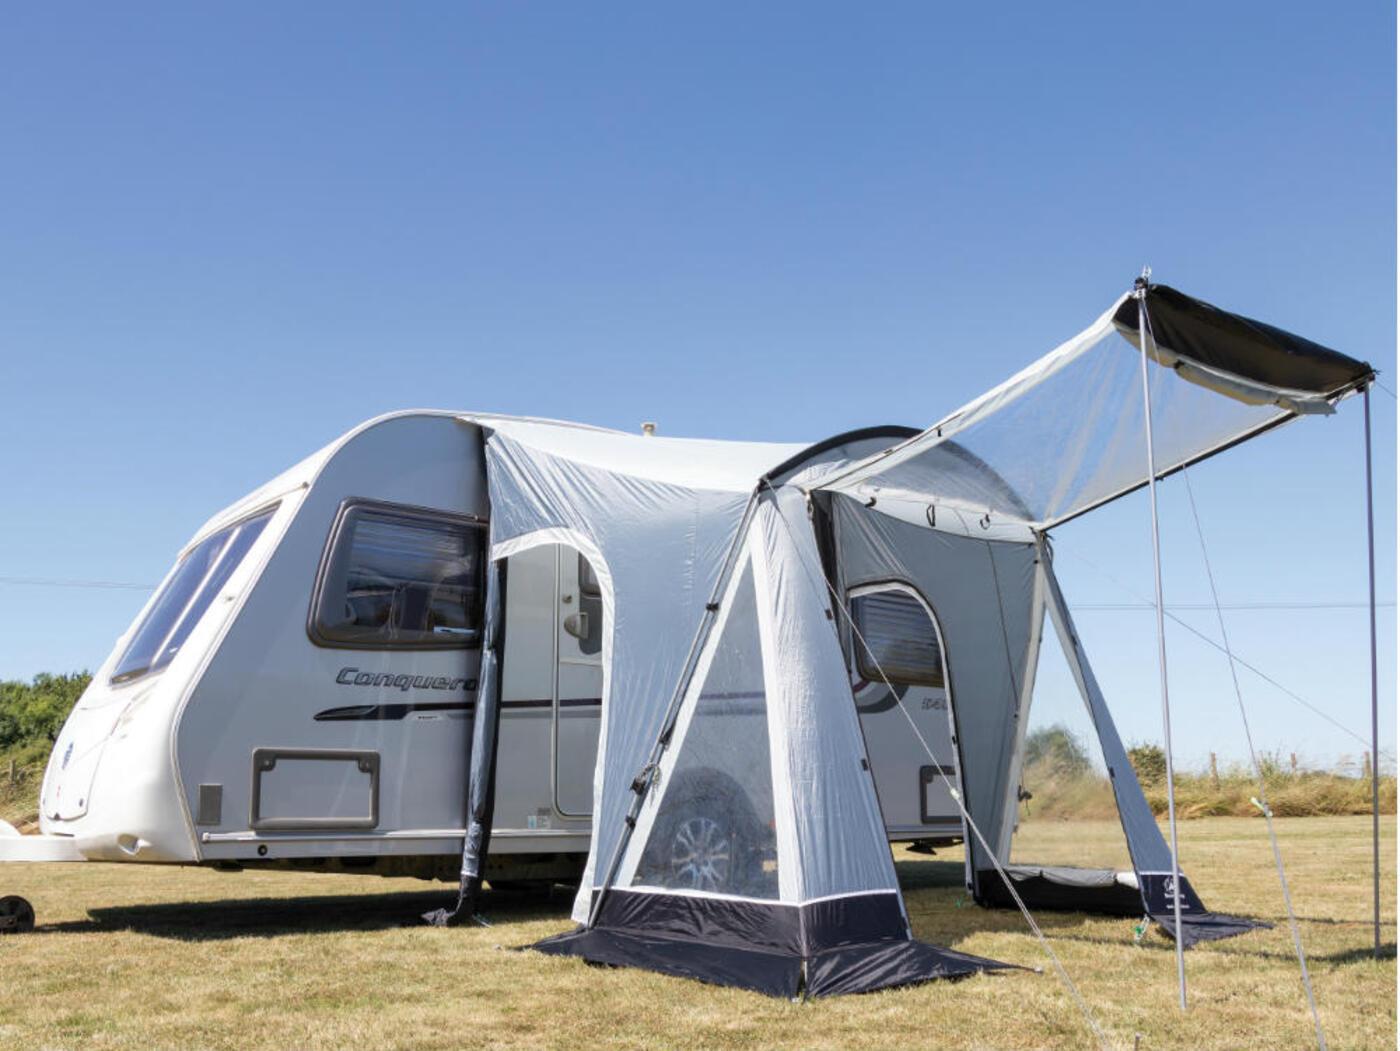 Sunncamp Swift 220 Porch Awning · Homestead Caravans